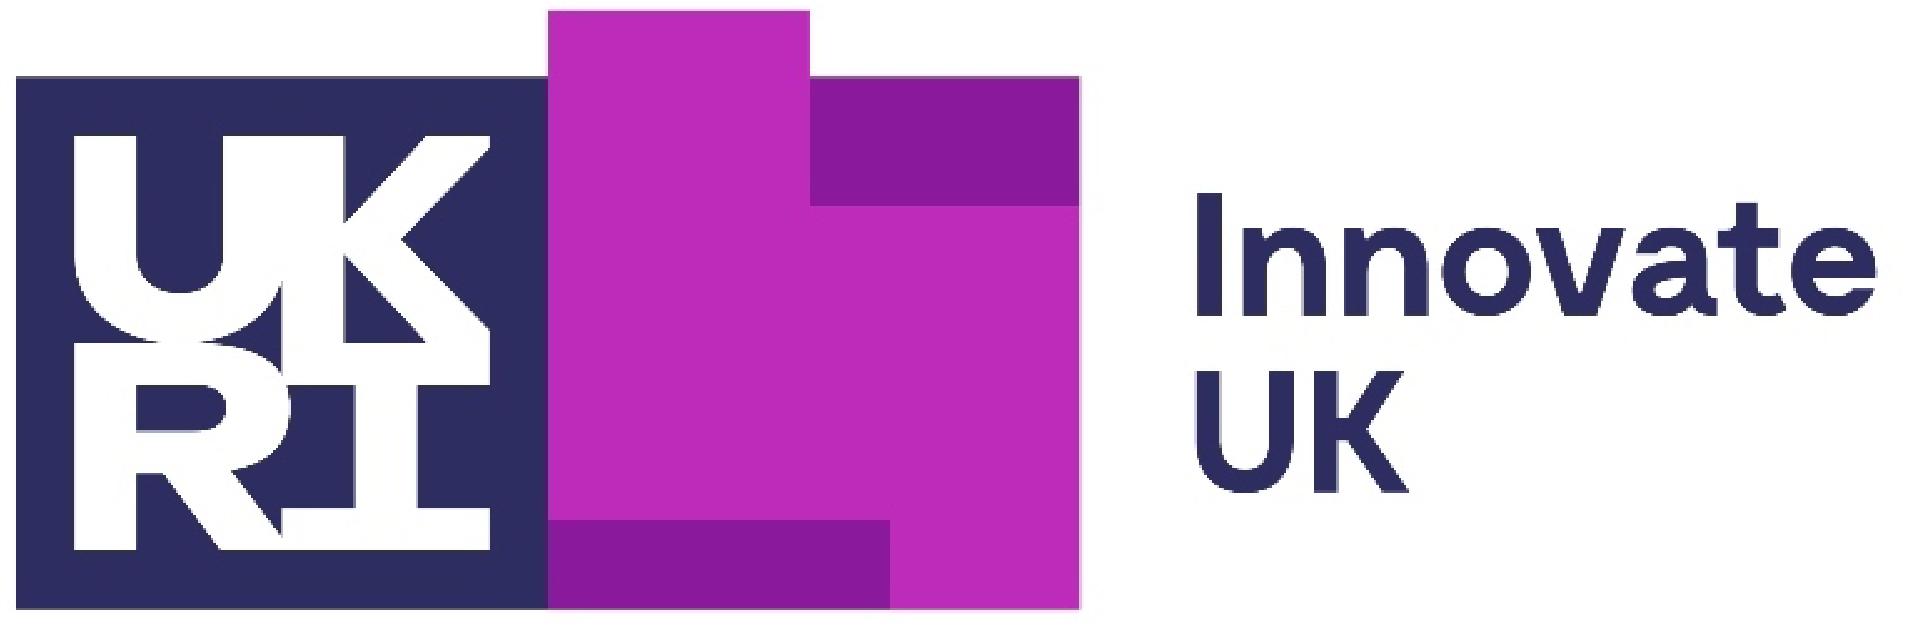 Innovate UK logo